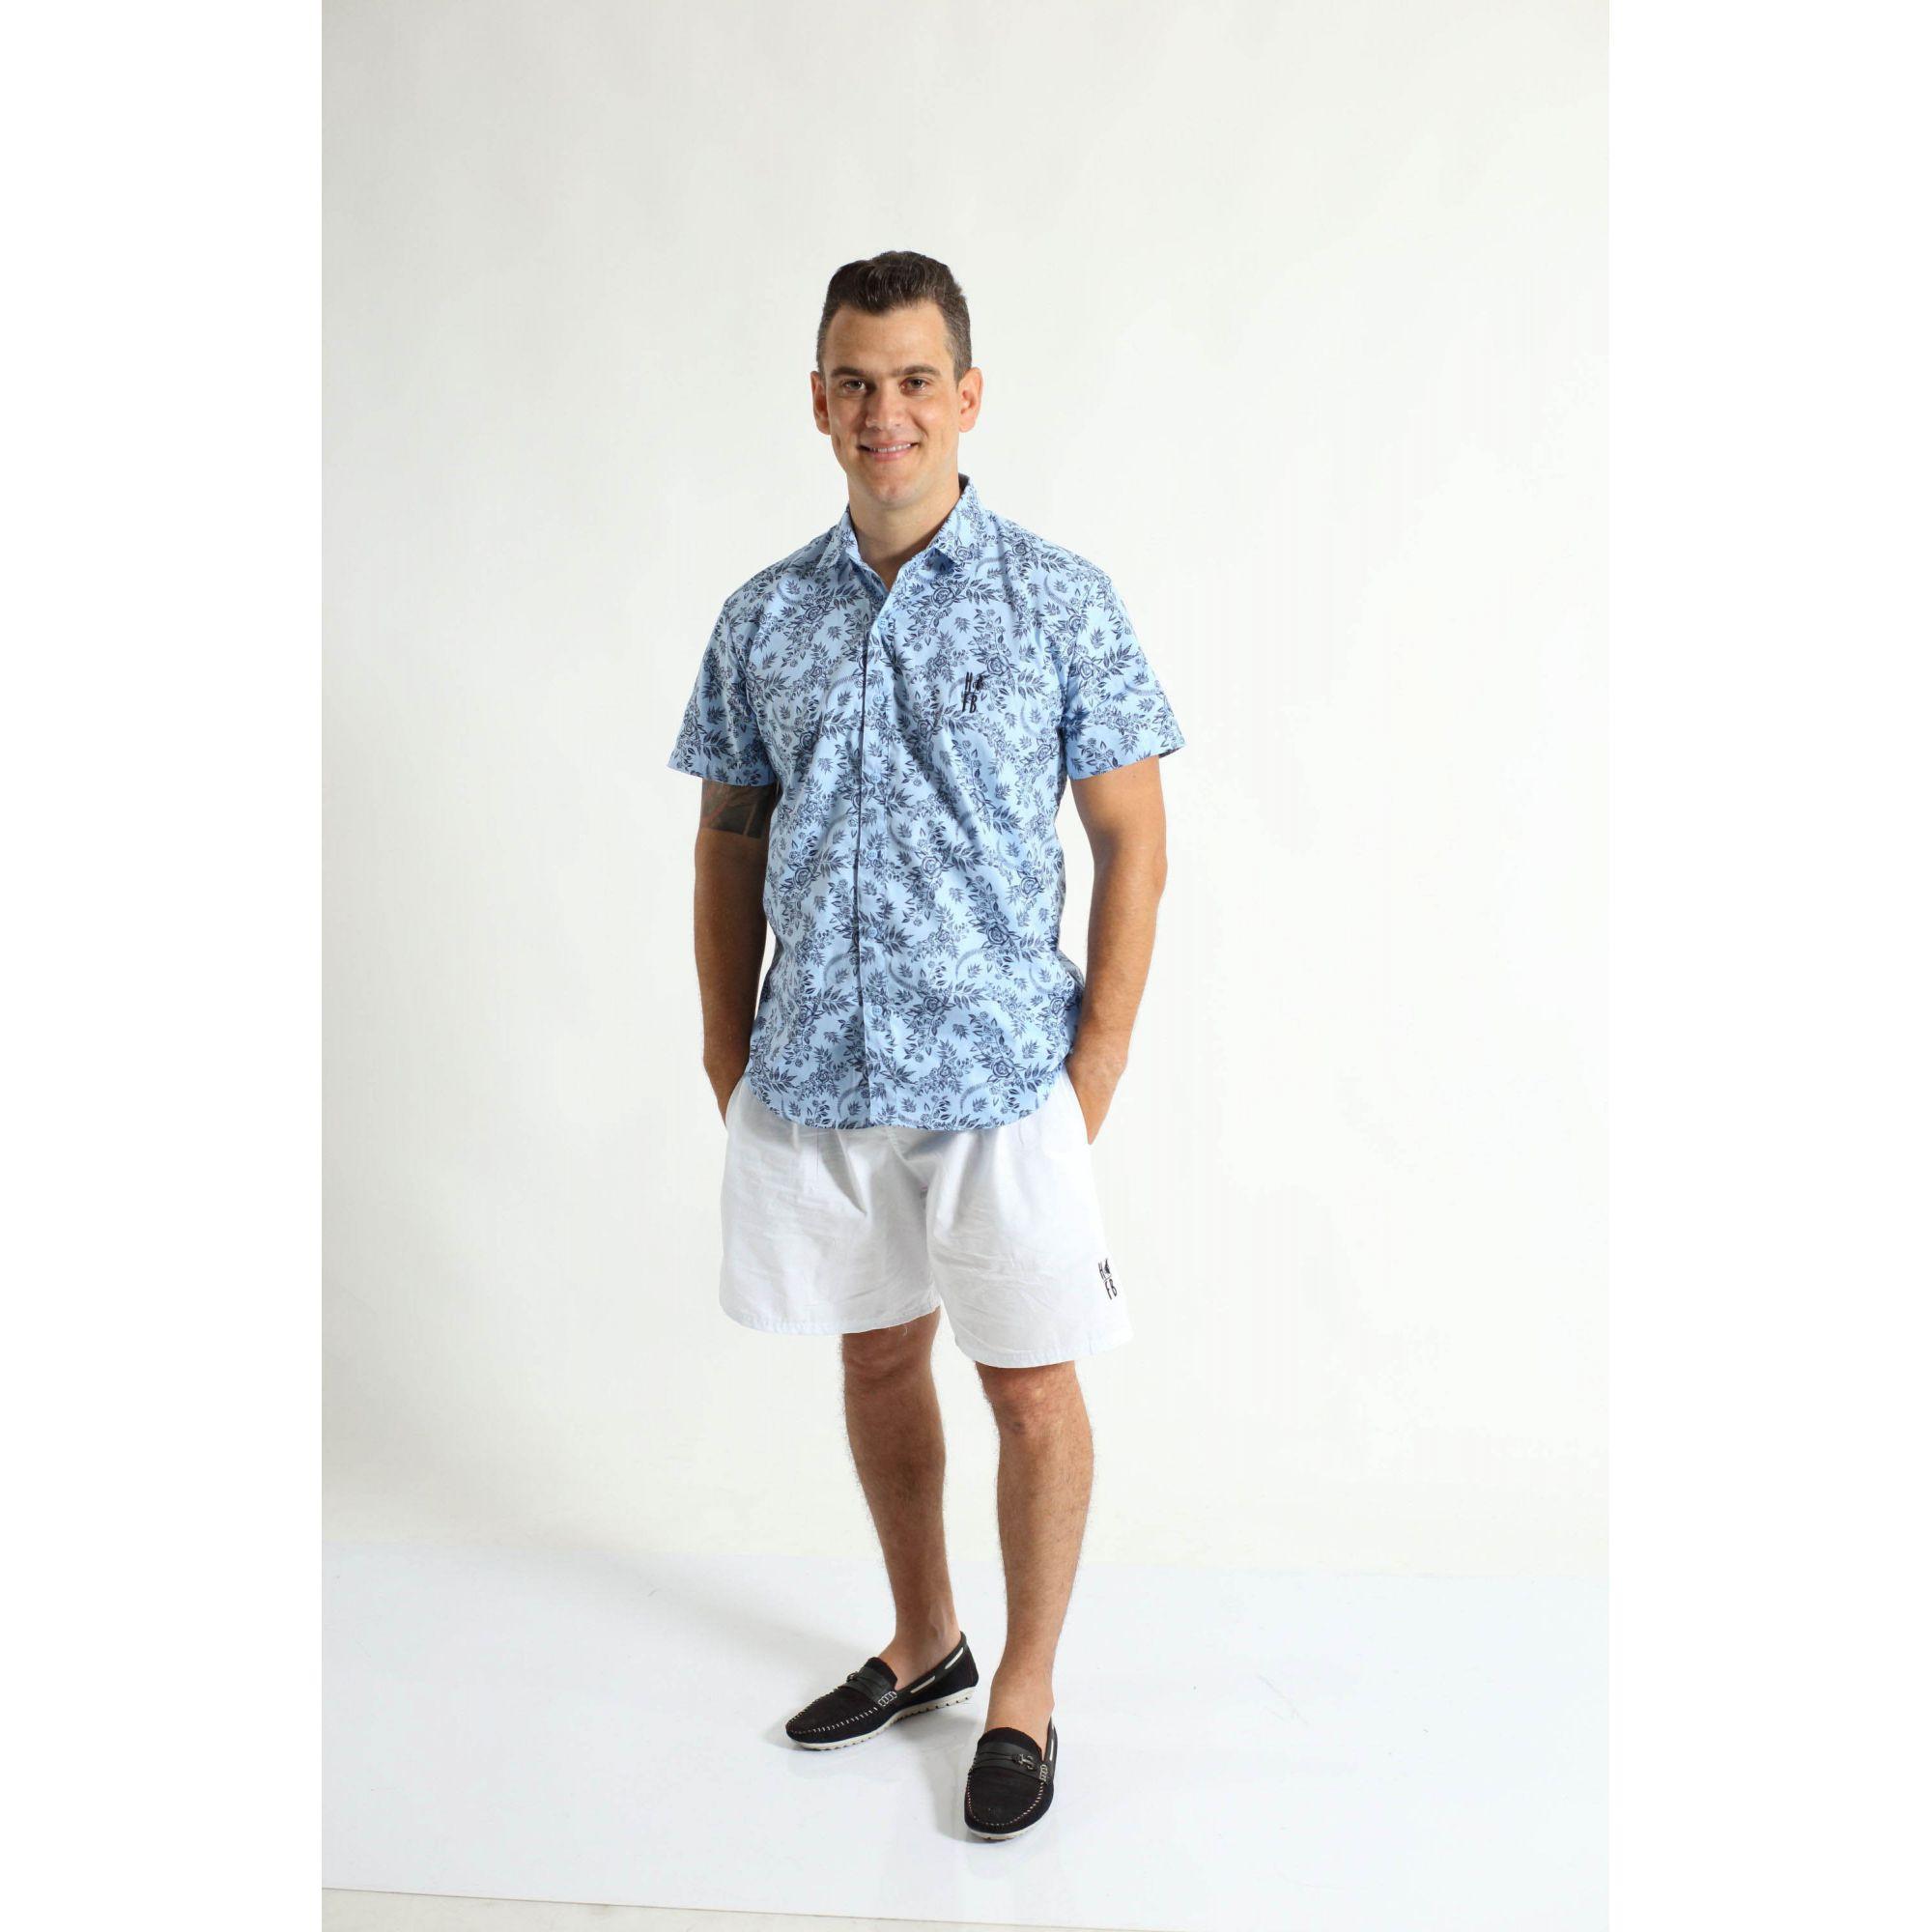 PAI E FILHO > Kit 02 Bermudas Branca  [Coleção Tal Pai Tal Filho]  - Heitor Fashion Brazil